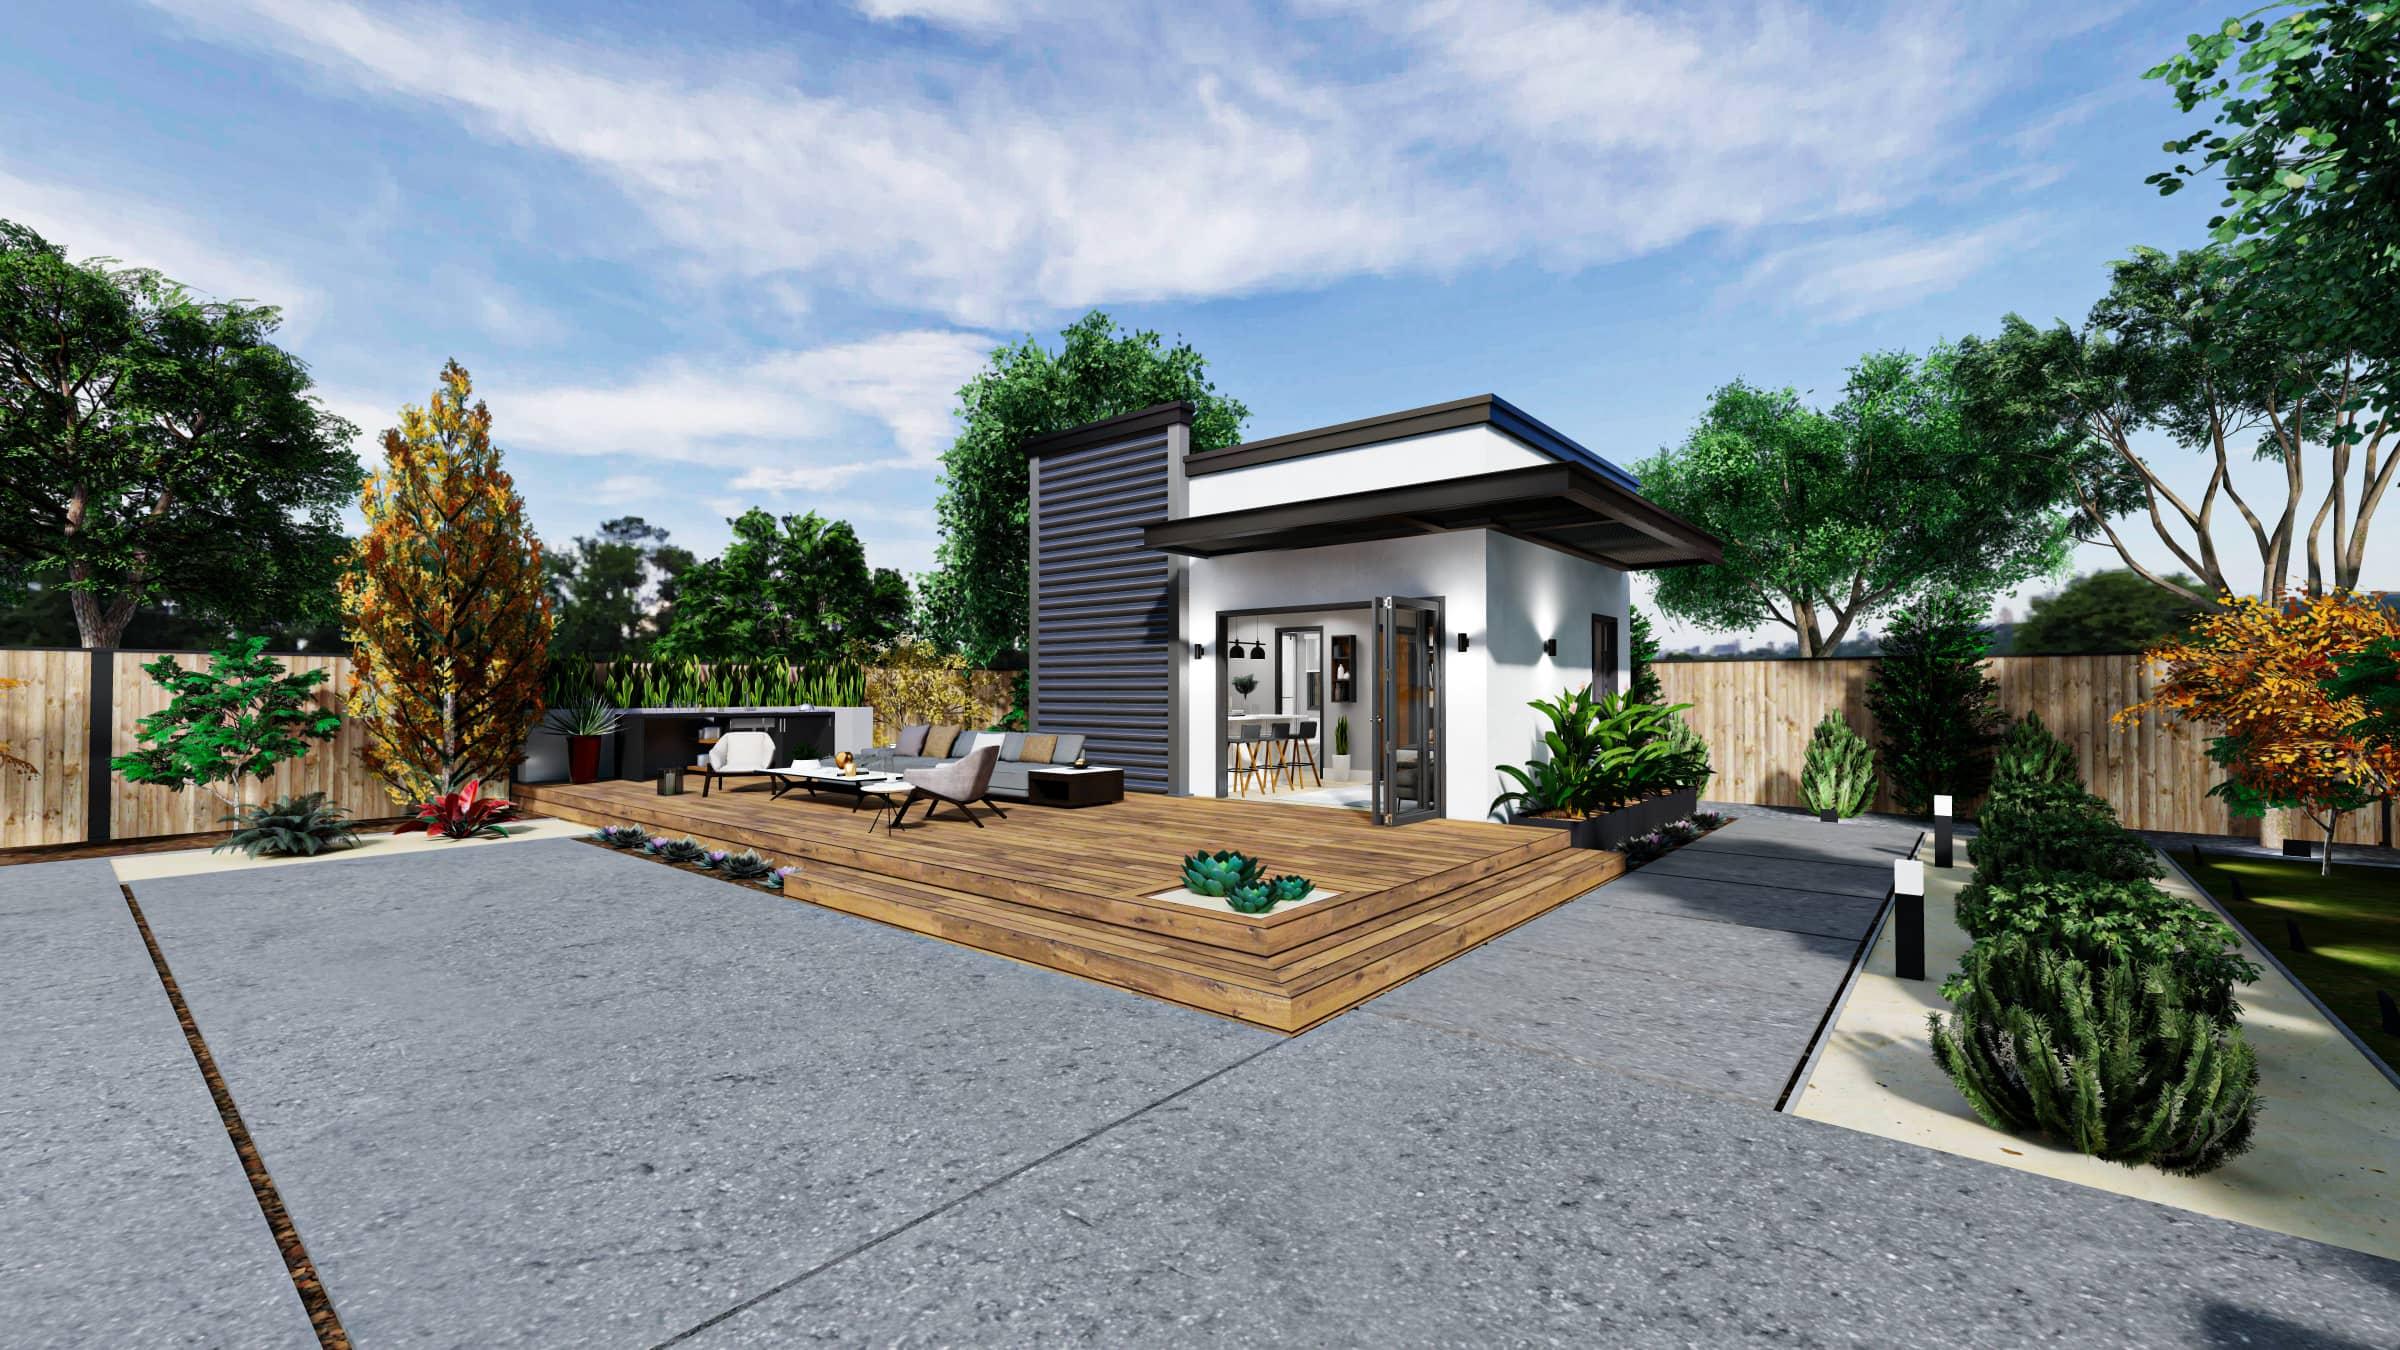 Studio Premium ADU 300 square feet for ADU Catalog by Multitaskr in San Diego County